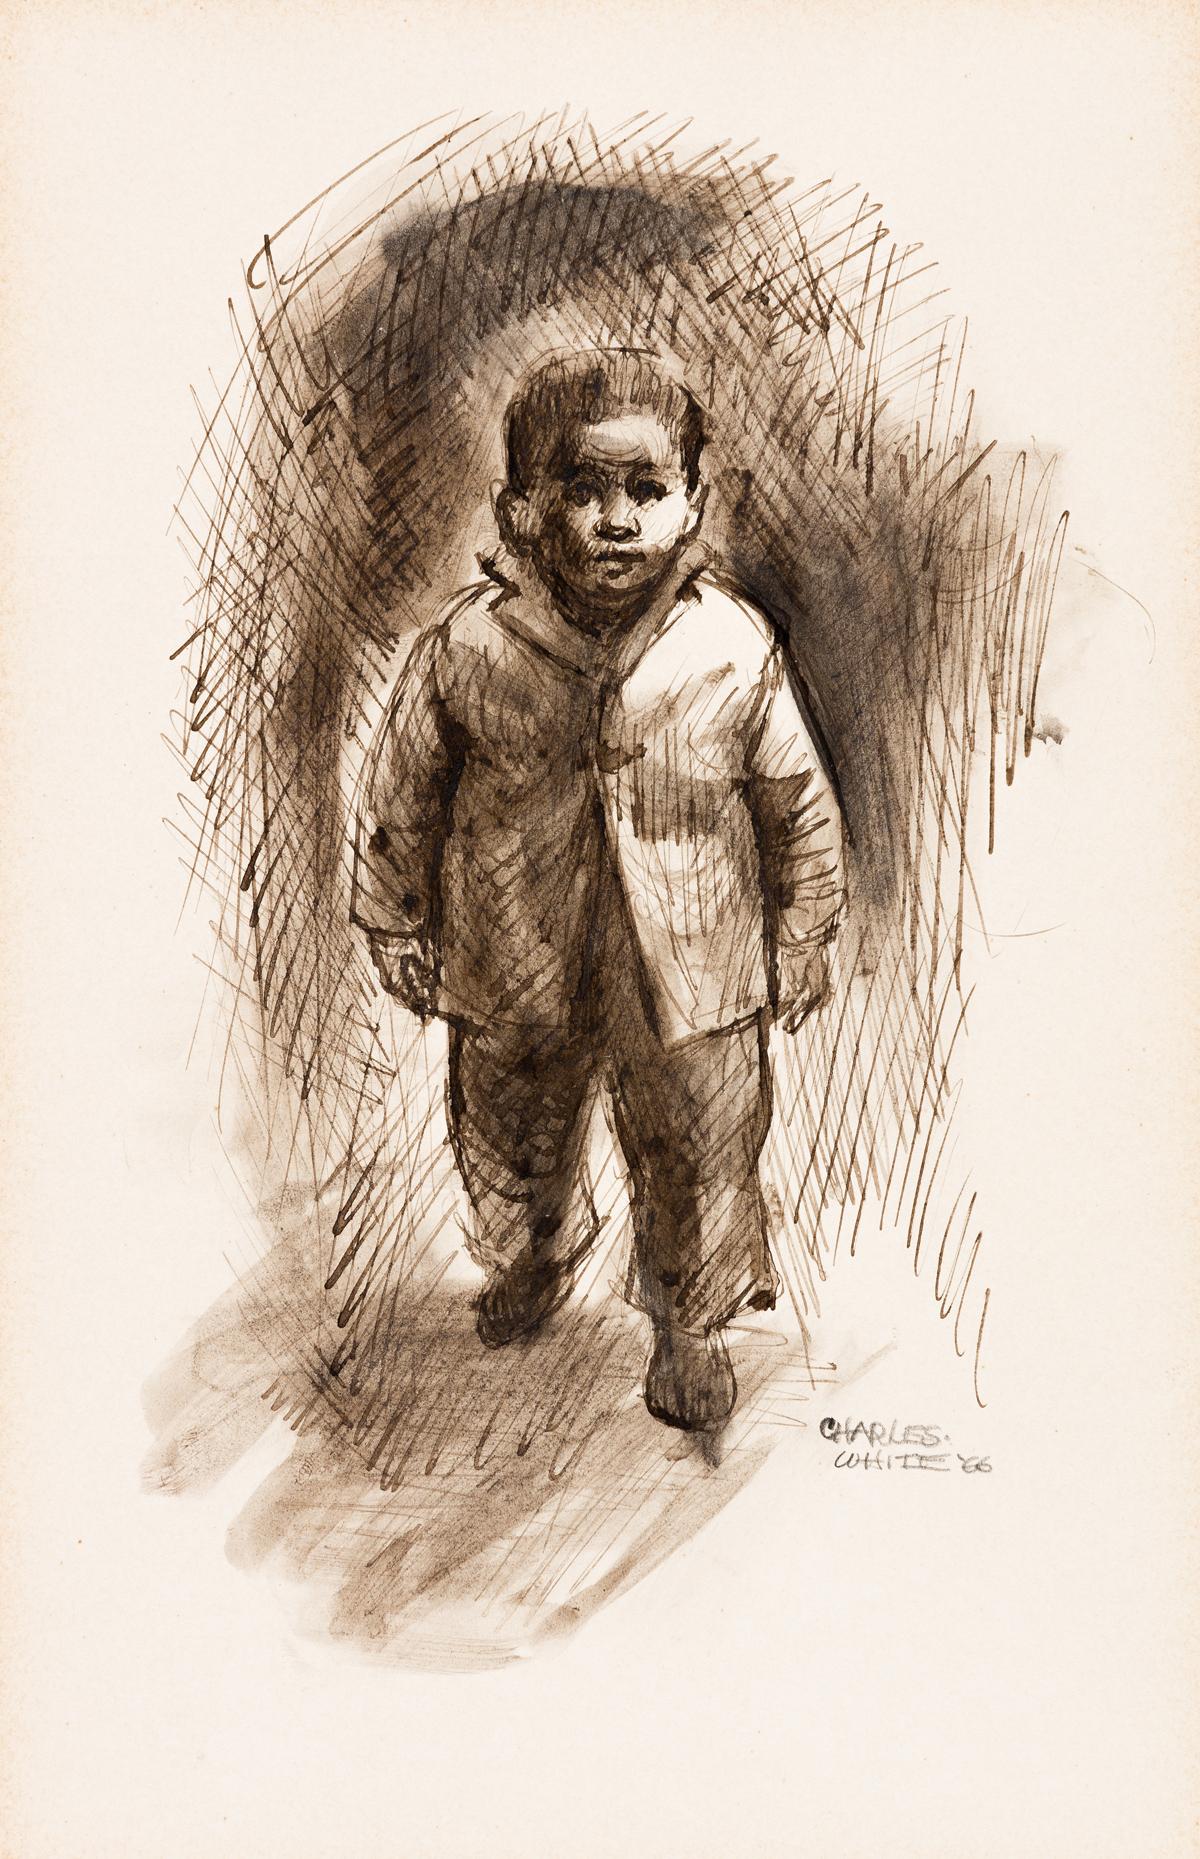 CHARLES WHITE (1918 -1979) Little Boy Walking (Child Walking).